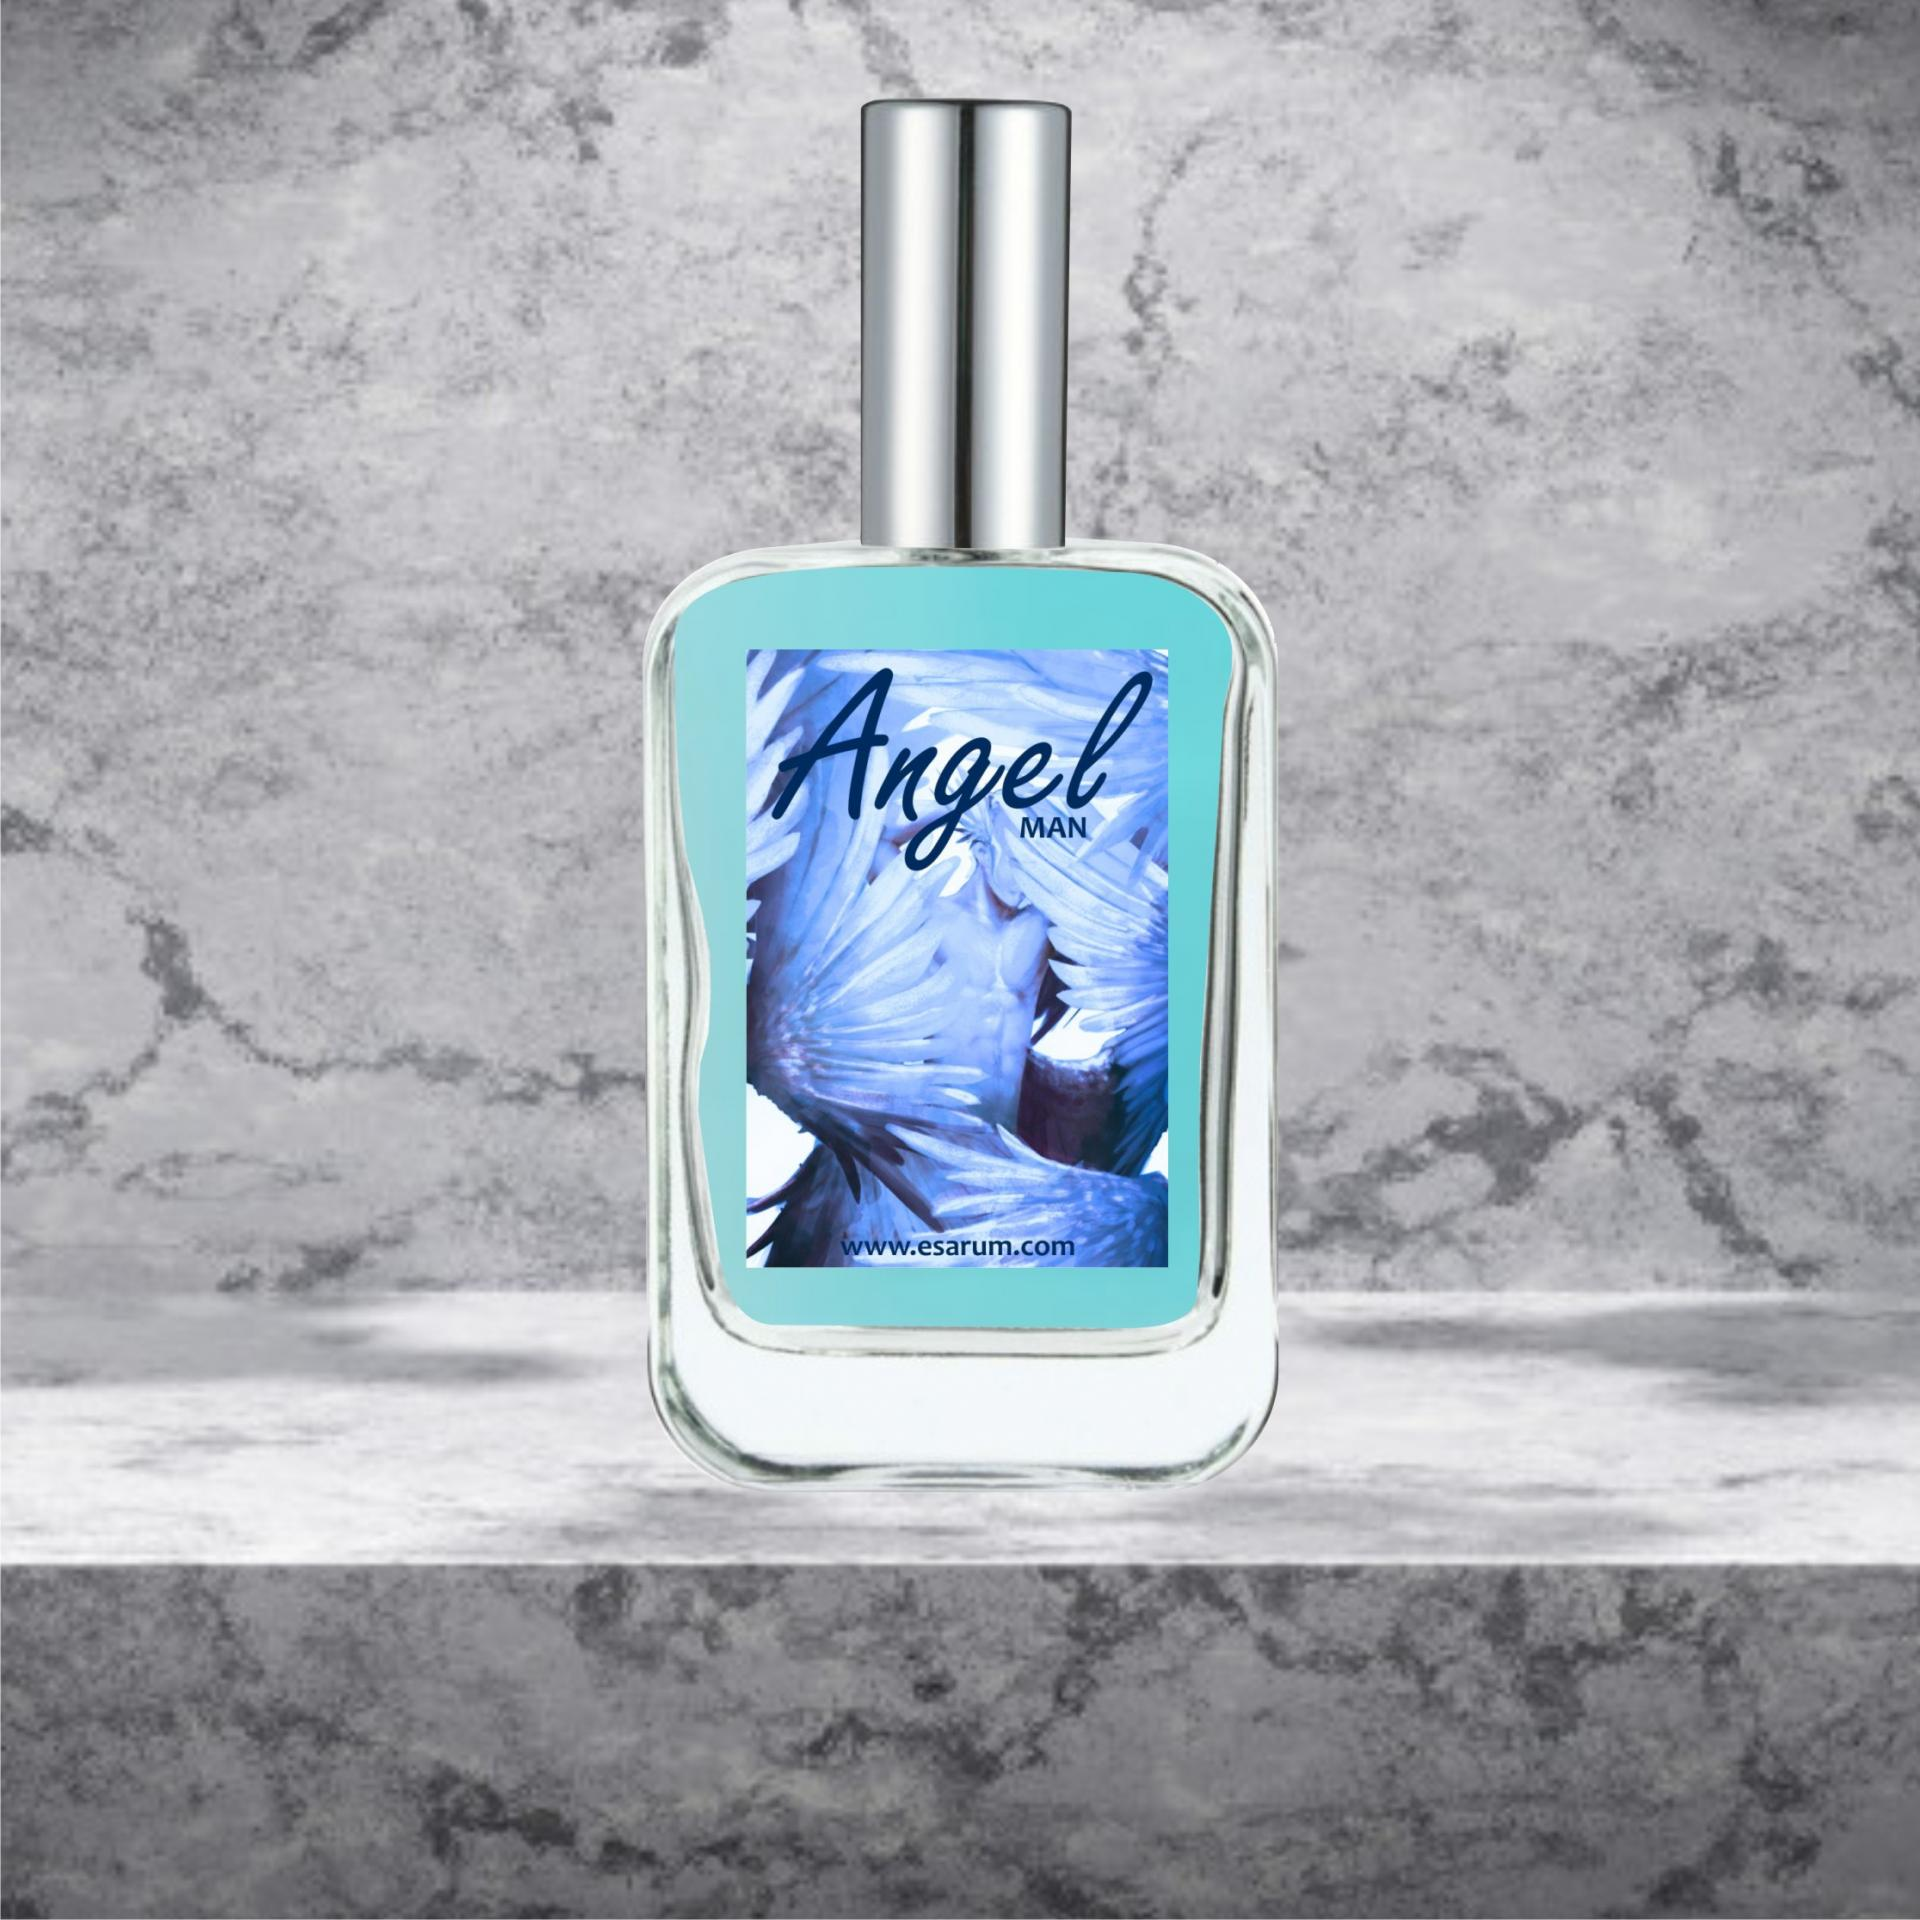 ESARUM.COM  - ANGEL MAN PERFUME PERMANENTE, 50 ML. Si te gusta ANGEL de THIERRY MUGLER !